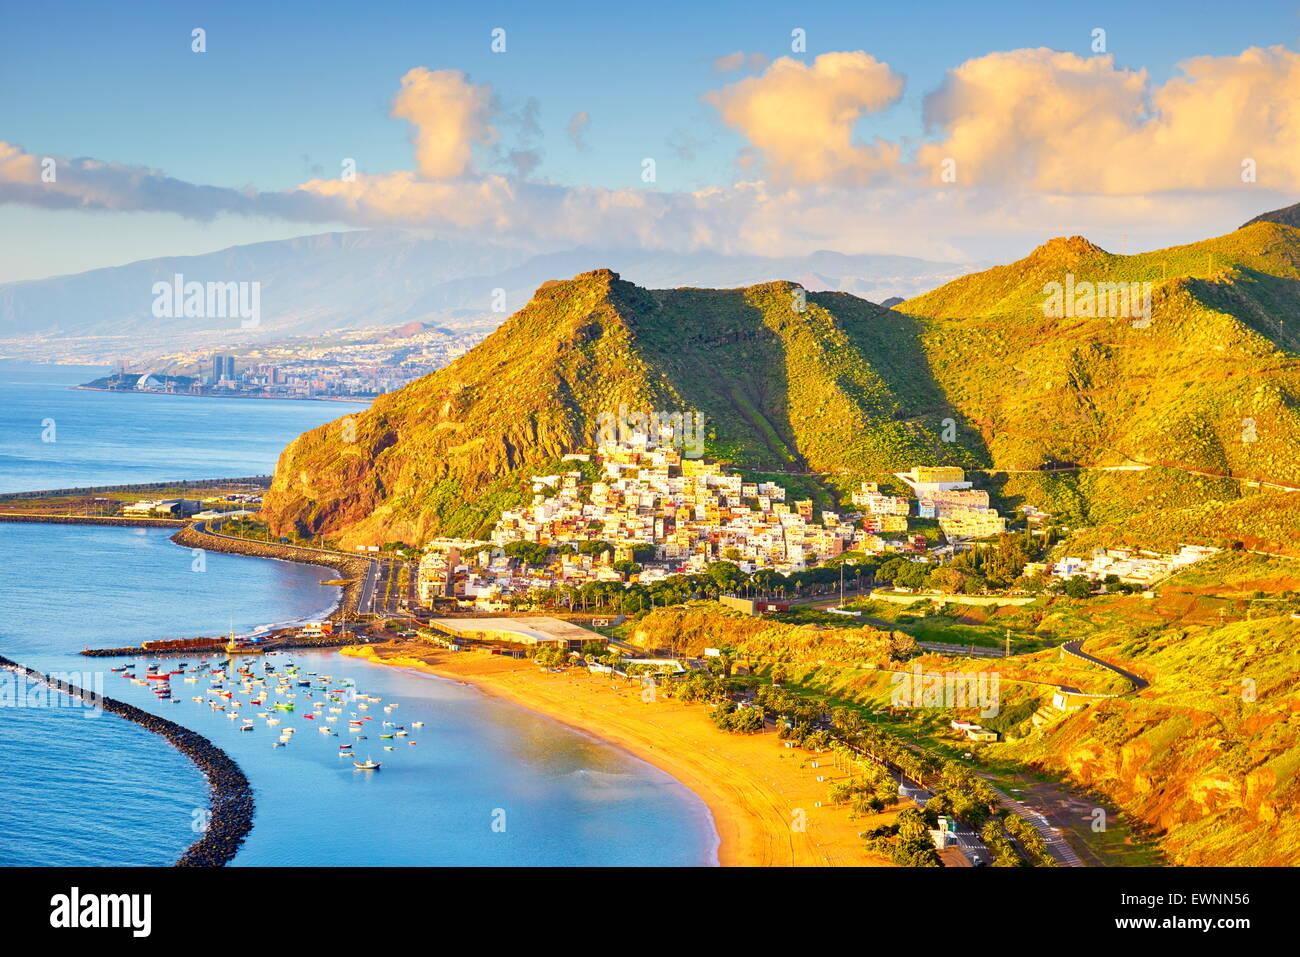 Tenerife - Teresitas Beach and San Andres Village, Canary Islands, Spain - Stock Image